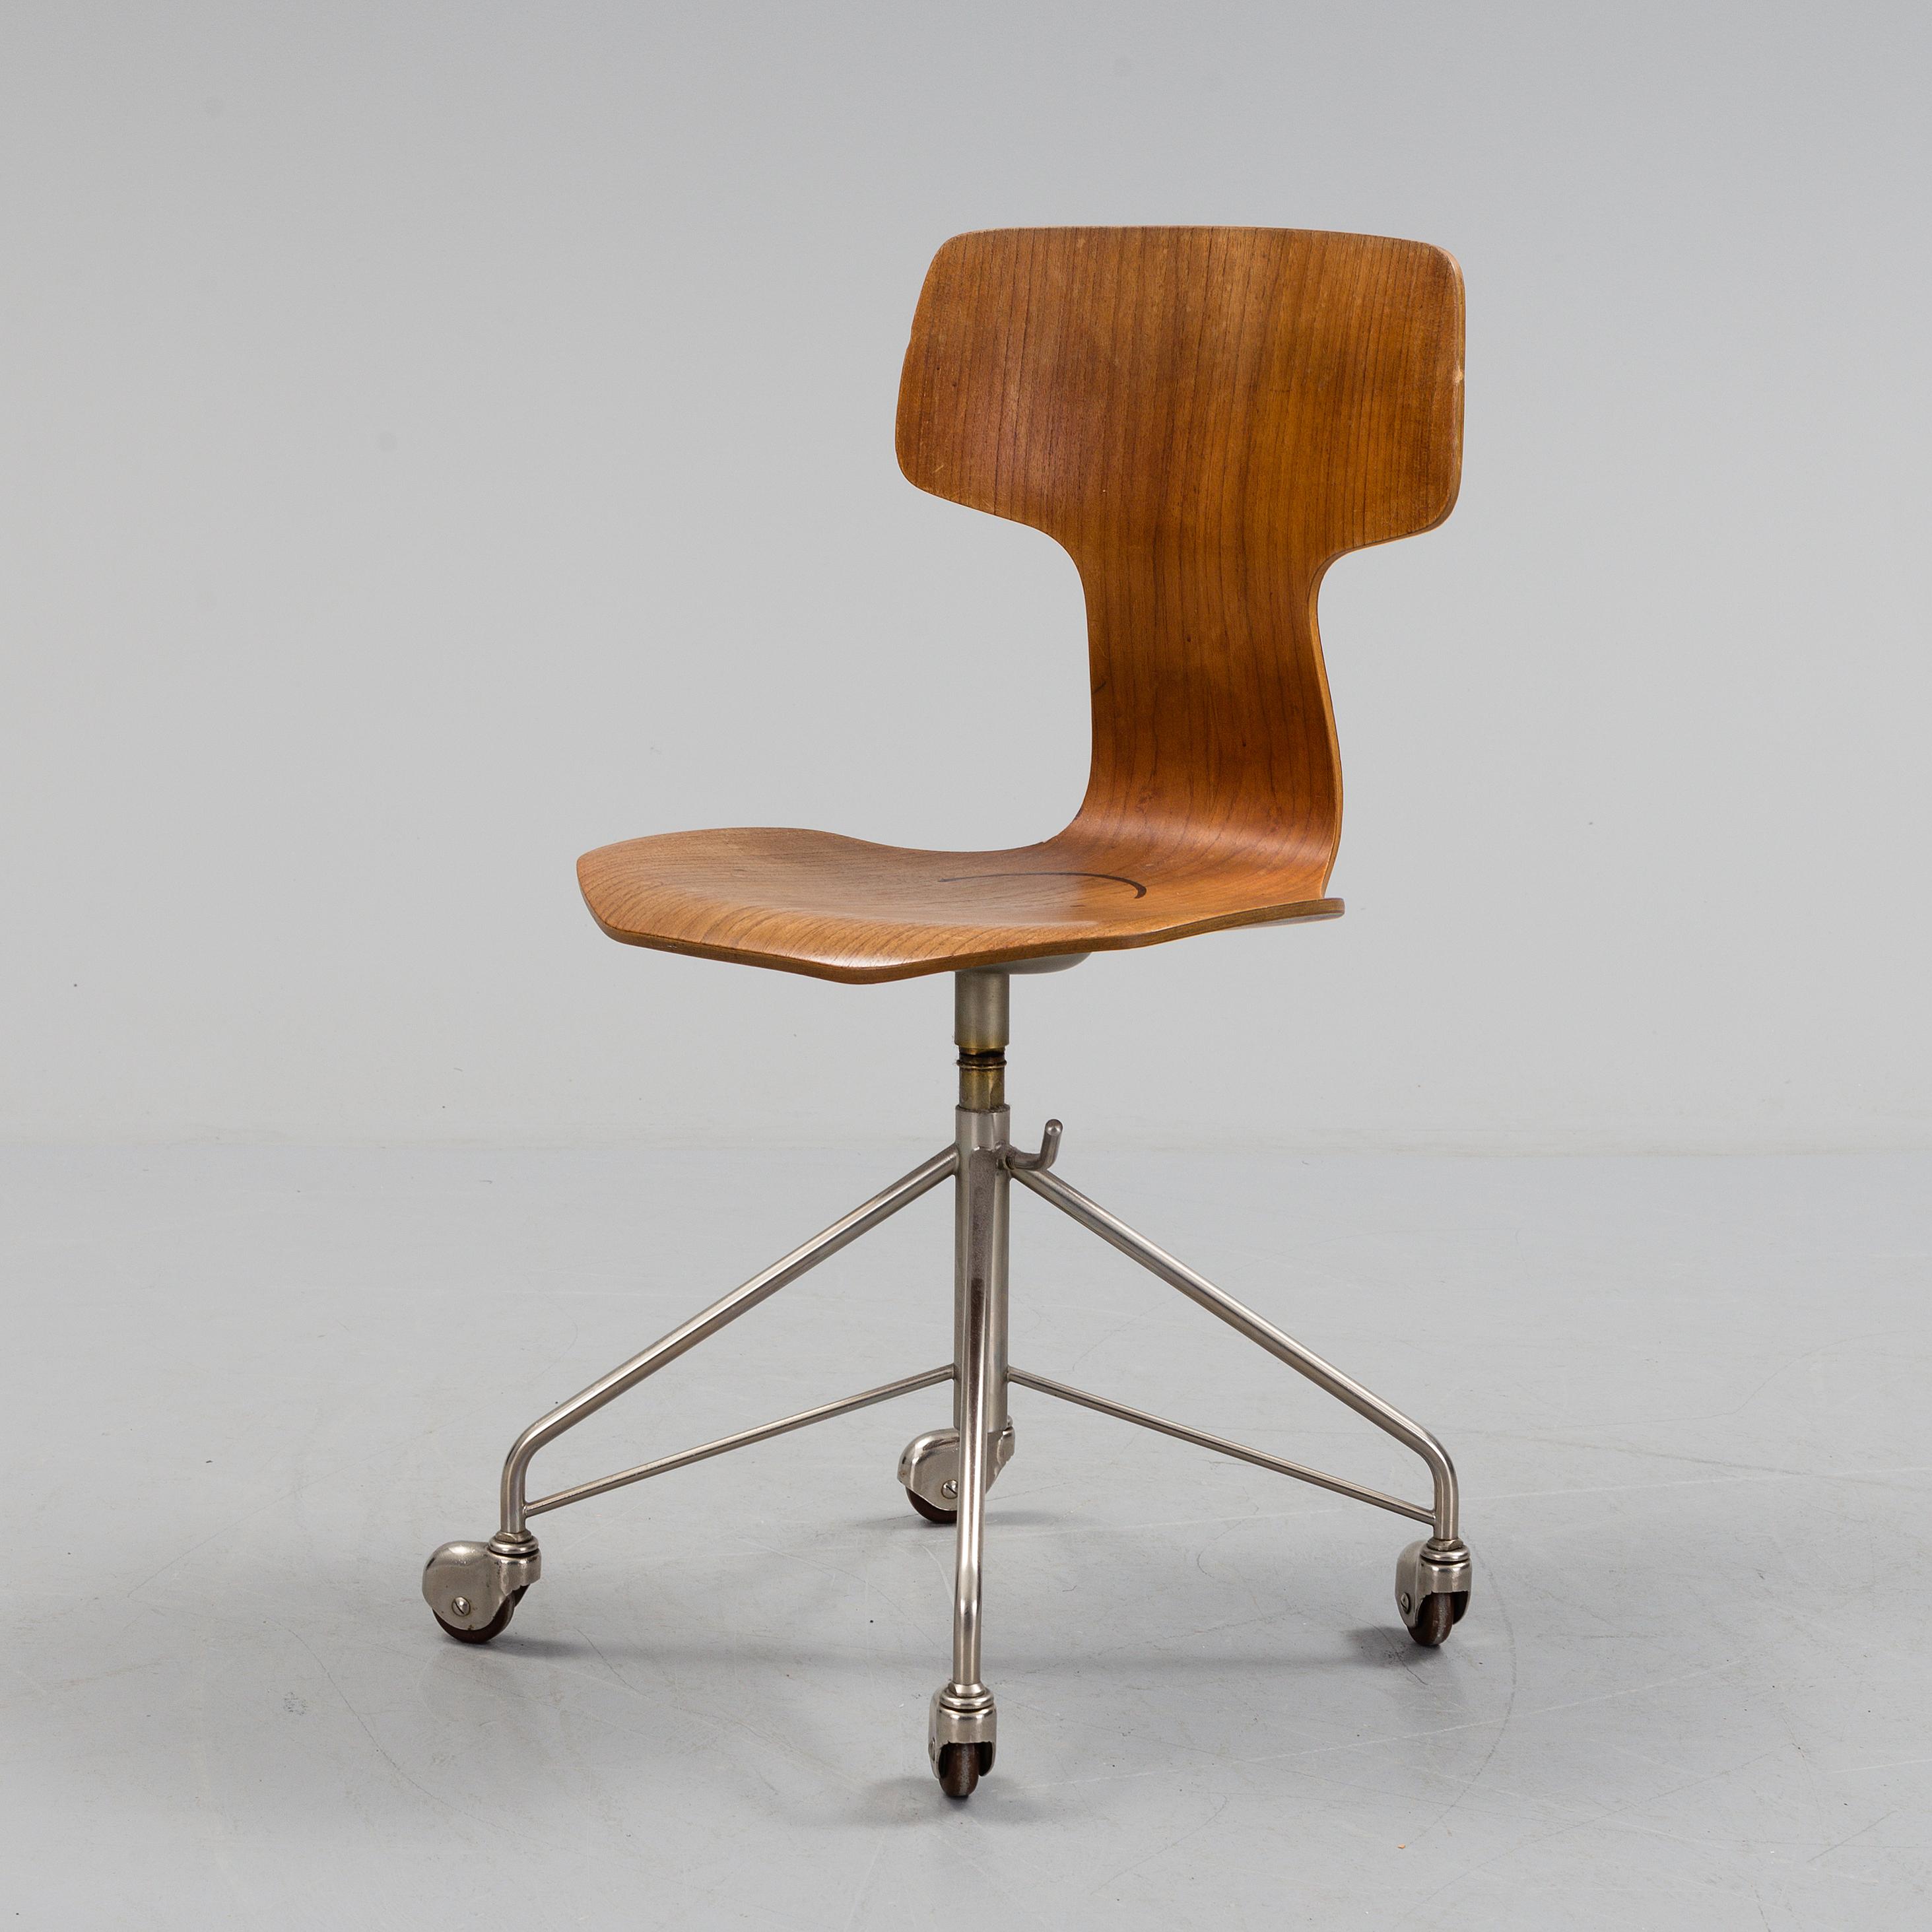 arne jacobsen an 1950s 60s office chair modell 3103 by arne